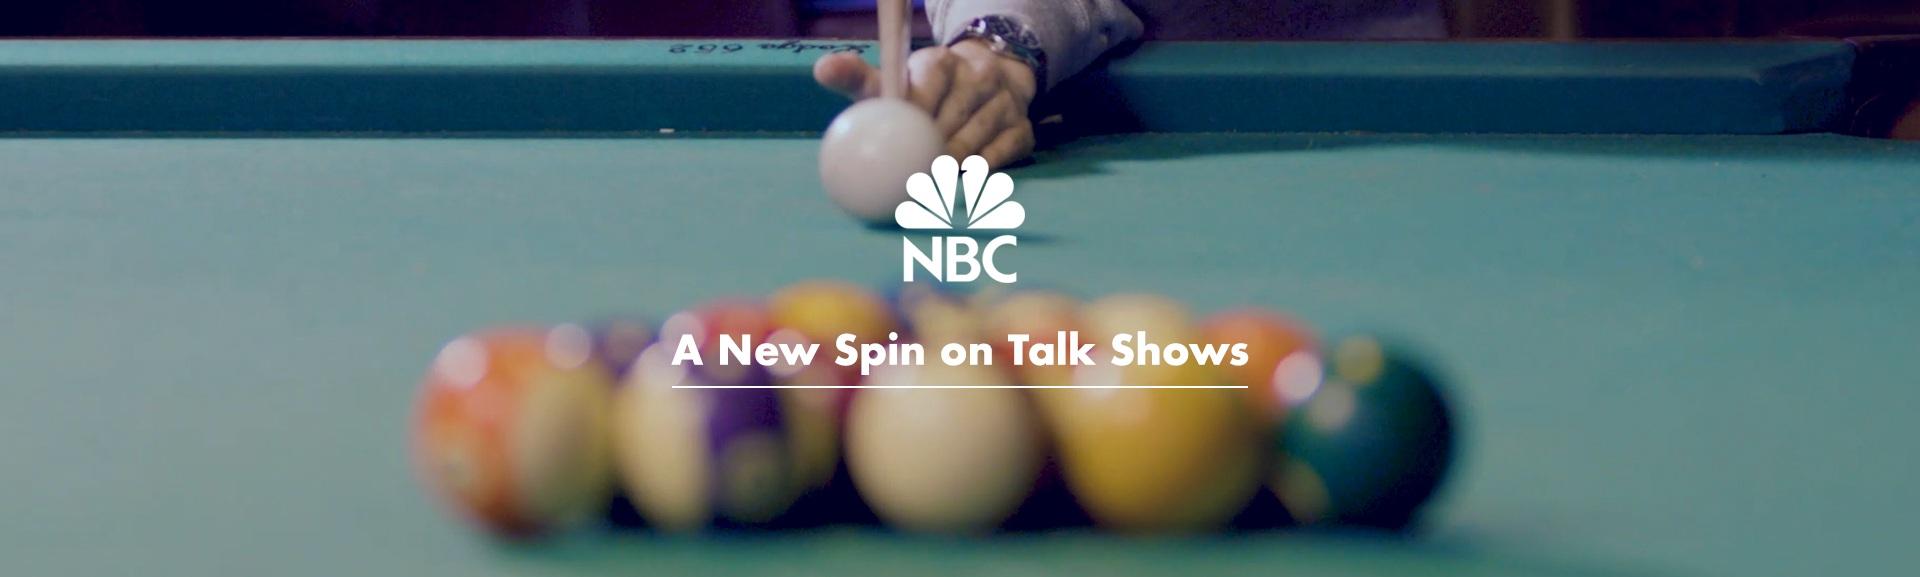 NBC+break+shot+carousel+banner.jpg